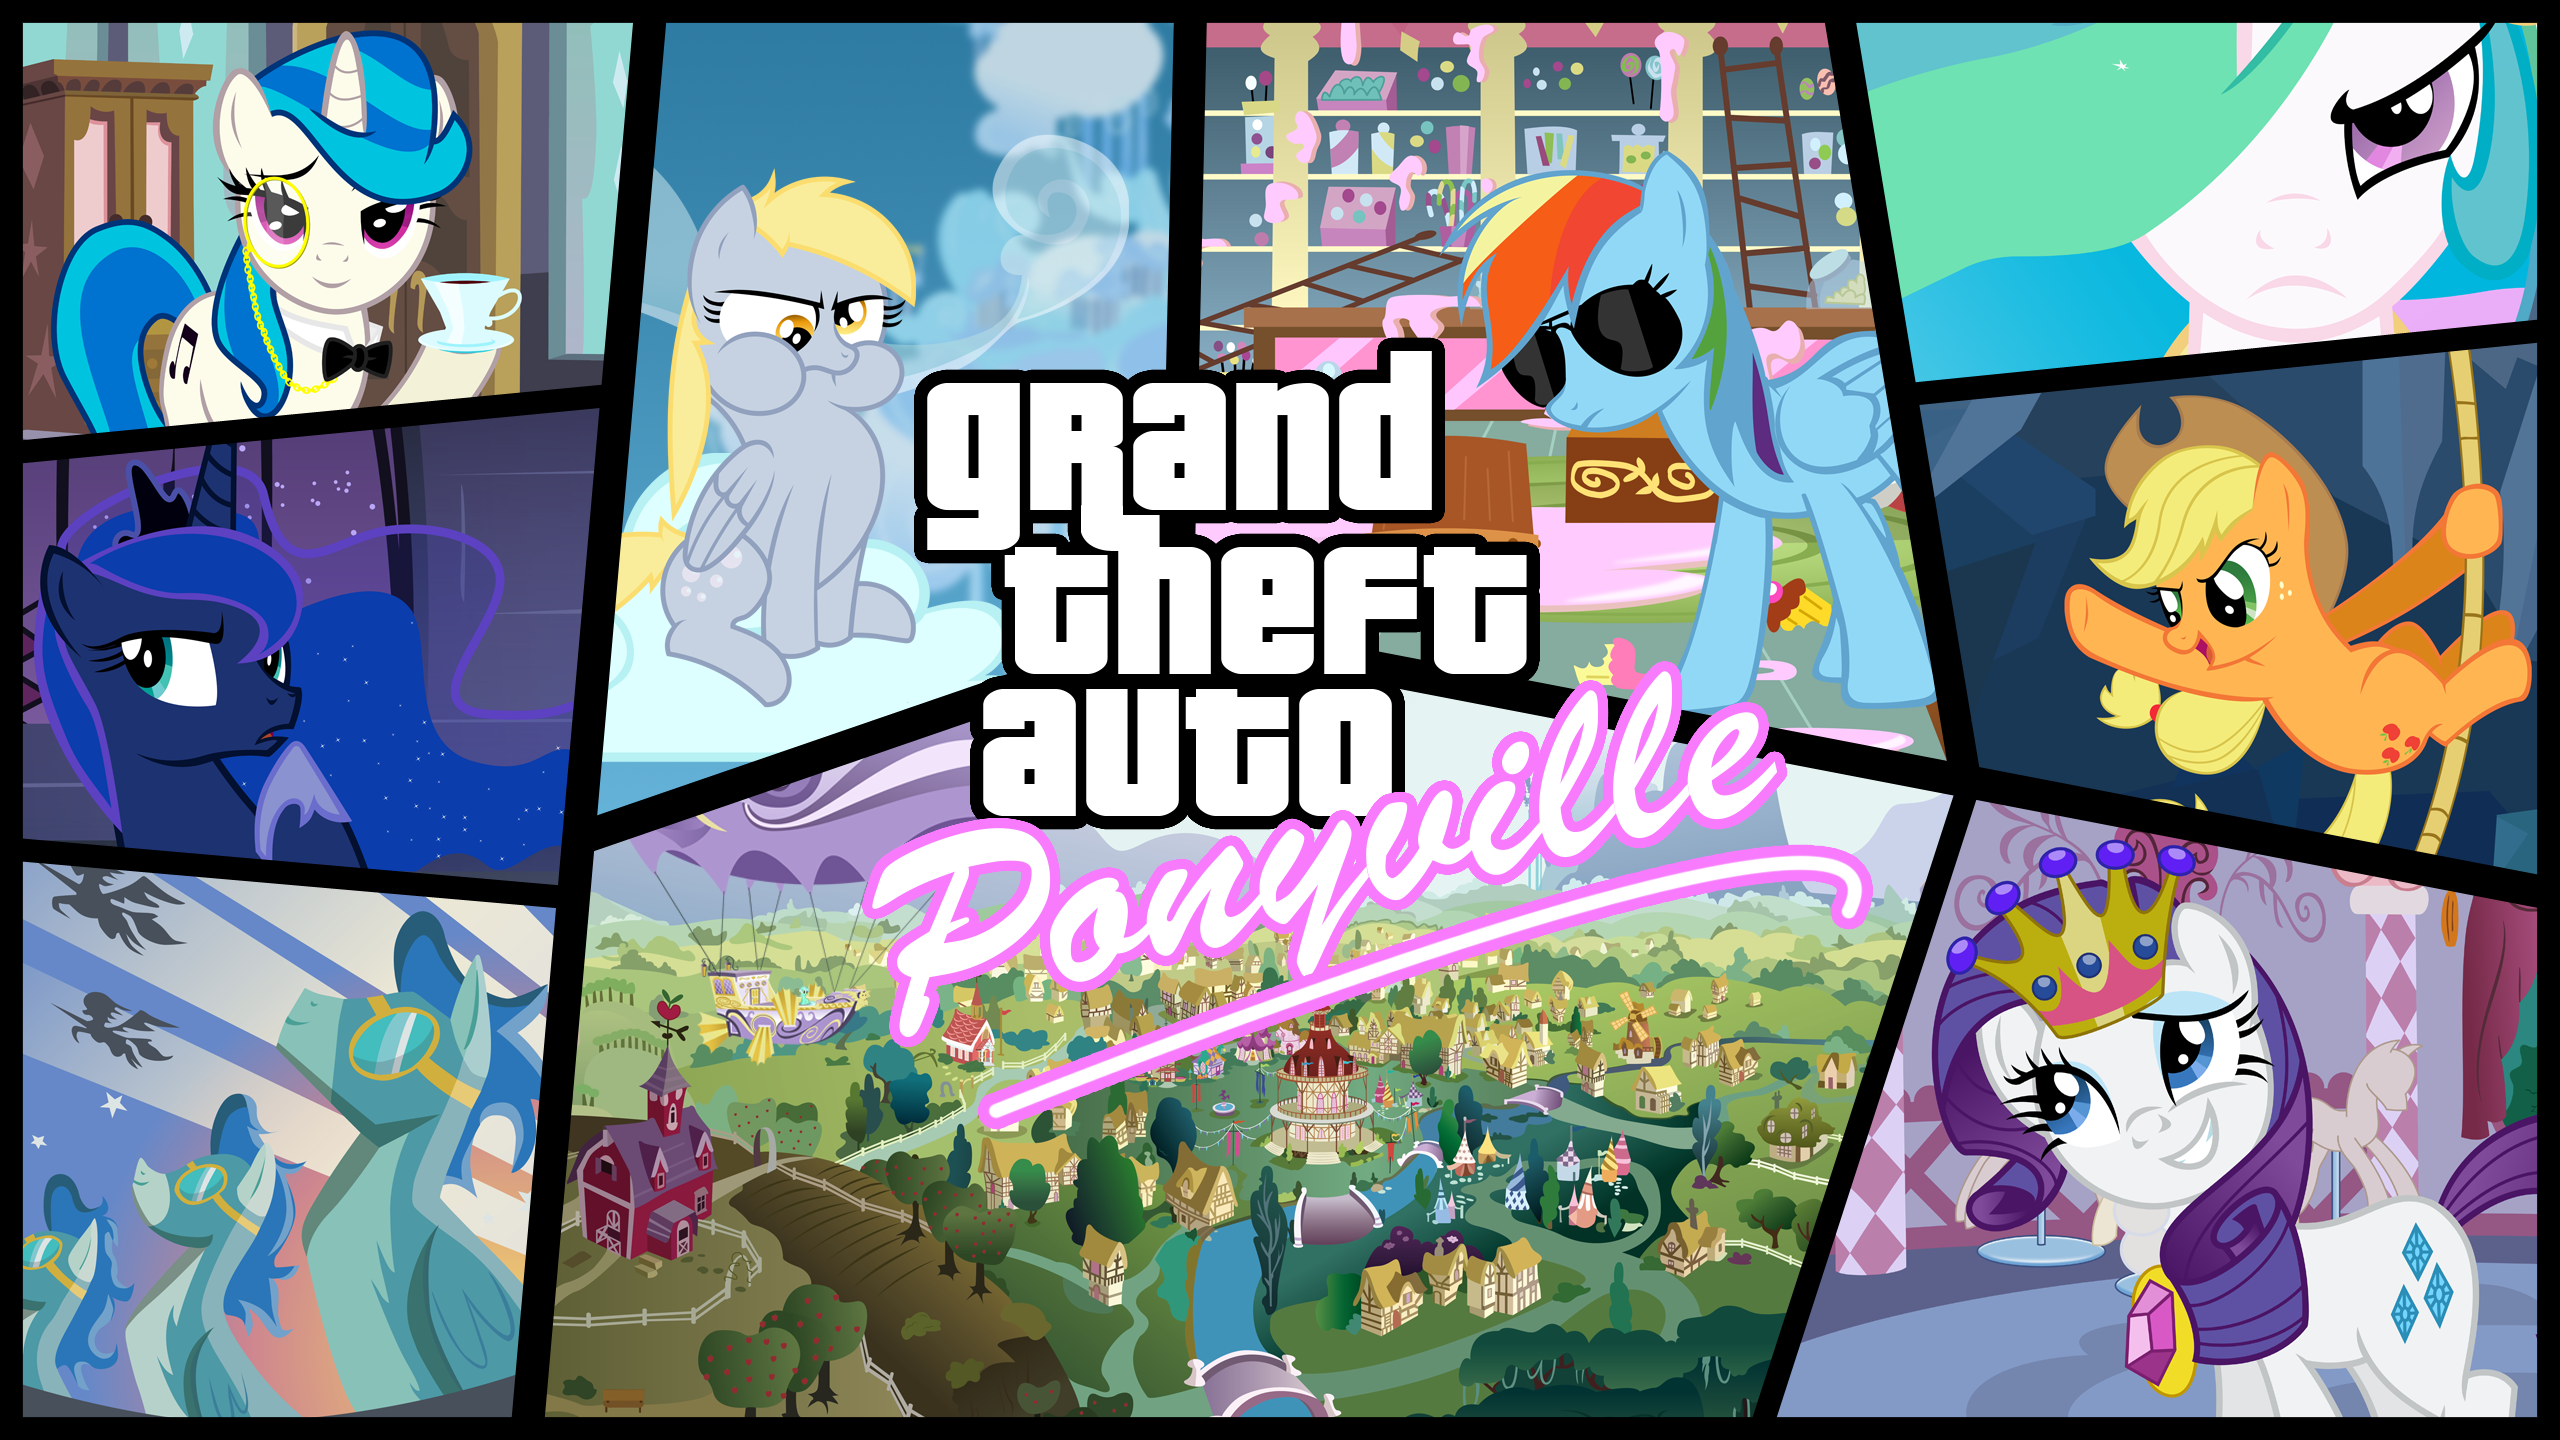 Grand Theft Auto: Ponyville HD by astyxlightning, BakaBrony, BlackGryph0n, Blanishna, Flizzick, GuruGrendo, Hellswolfeh, ikonradx, Kna, mandydax, miketueur, MisterLolrus, RatchetHuN, ShelltoonTV, SooYou, tamalesyatole, thehellbean, time015, UP1TER and ZuTheSkunk